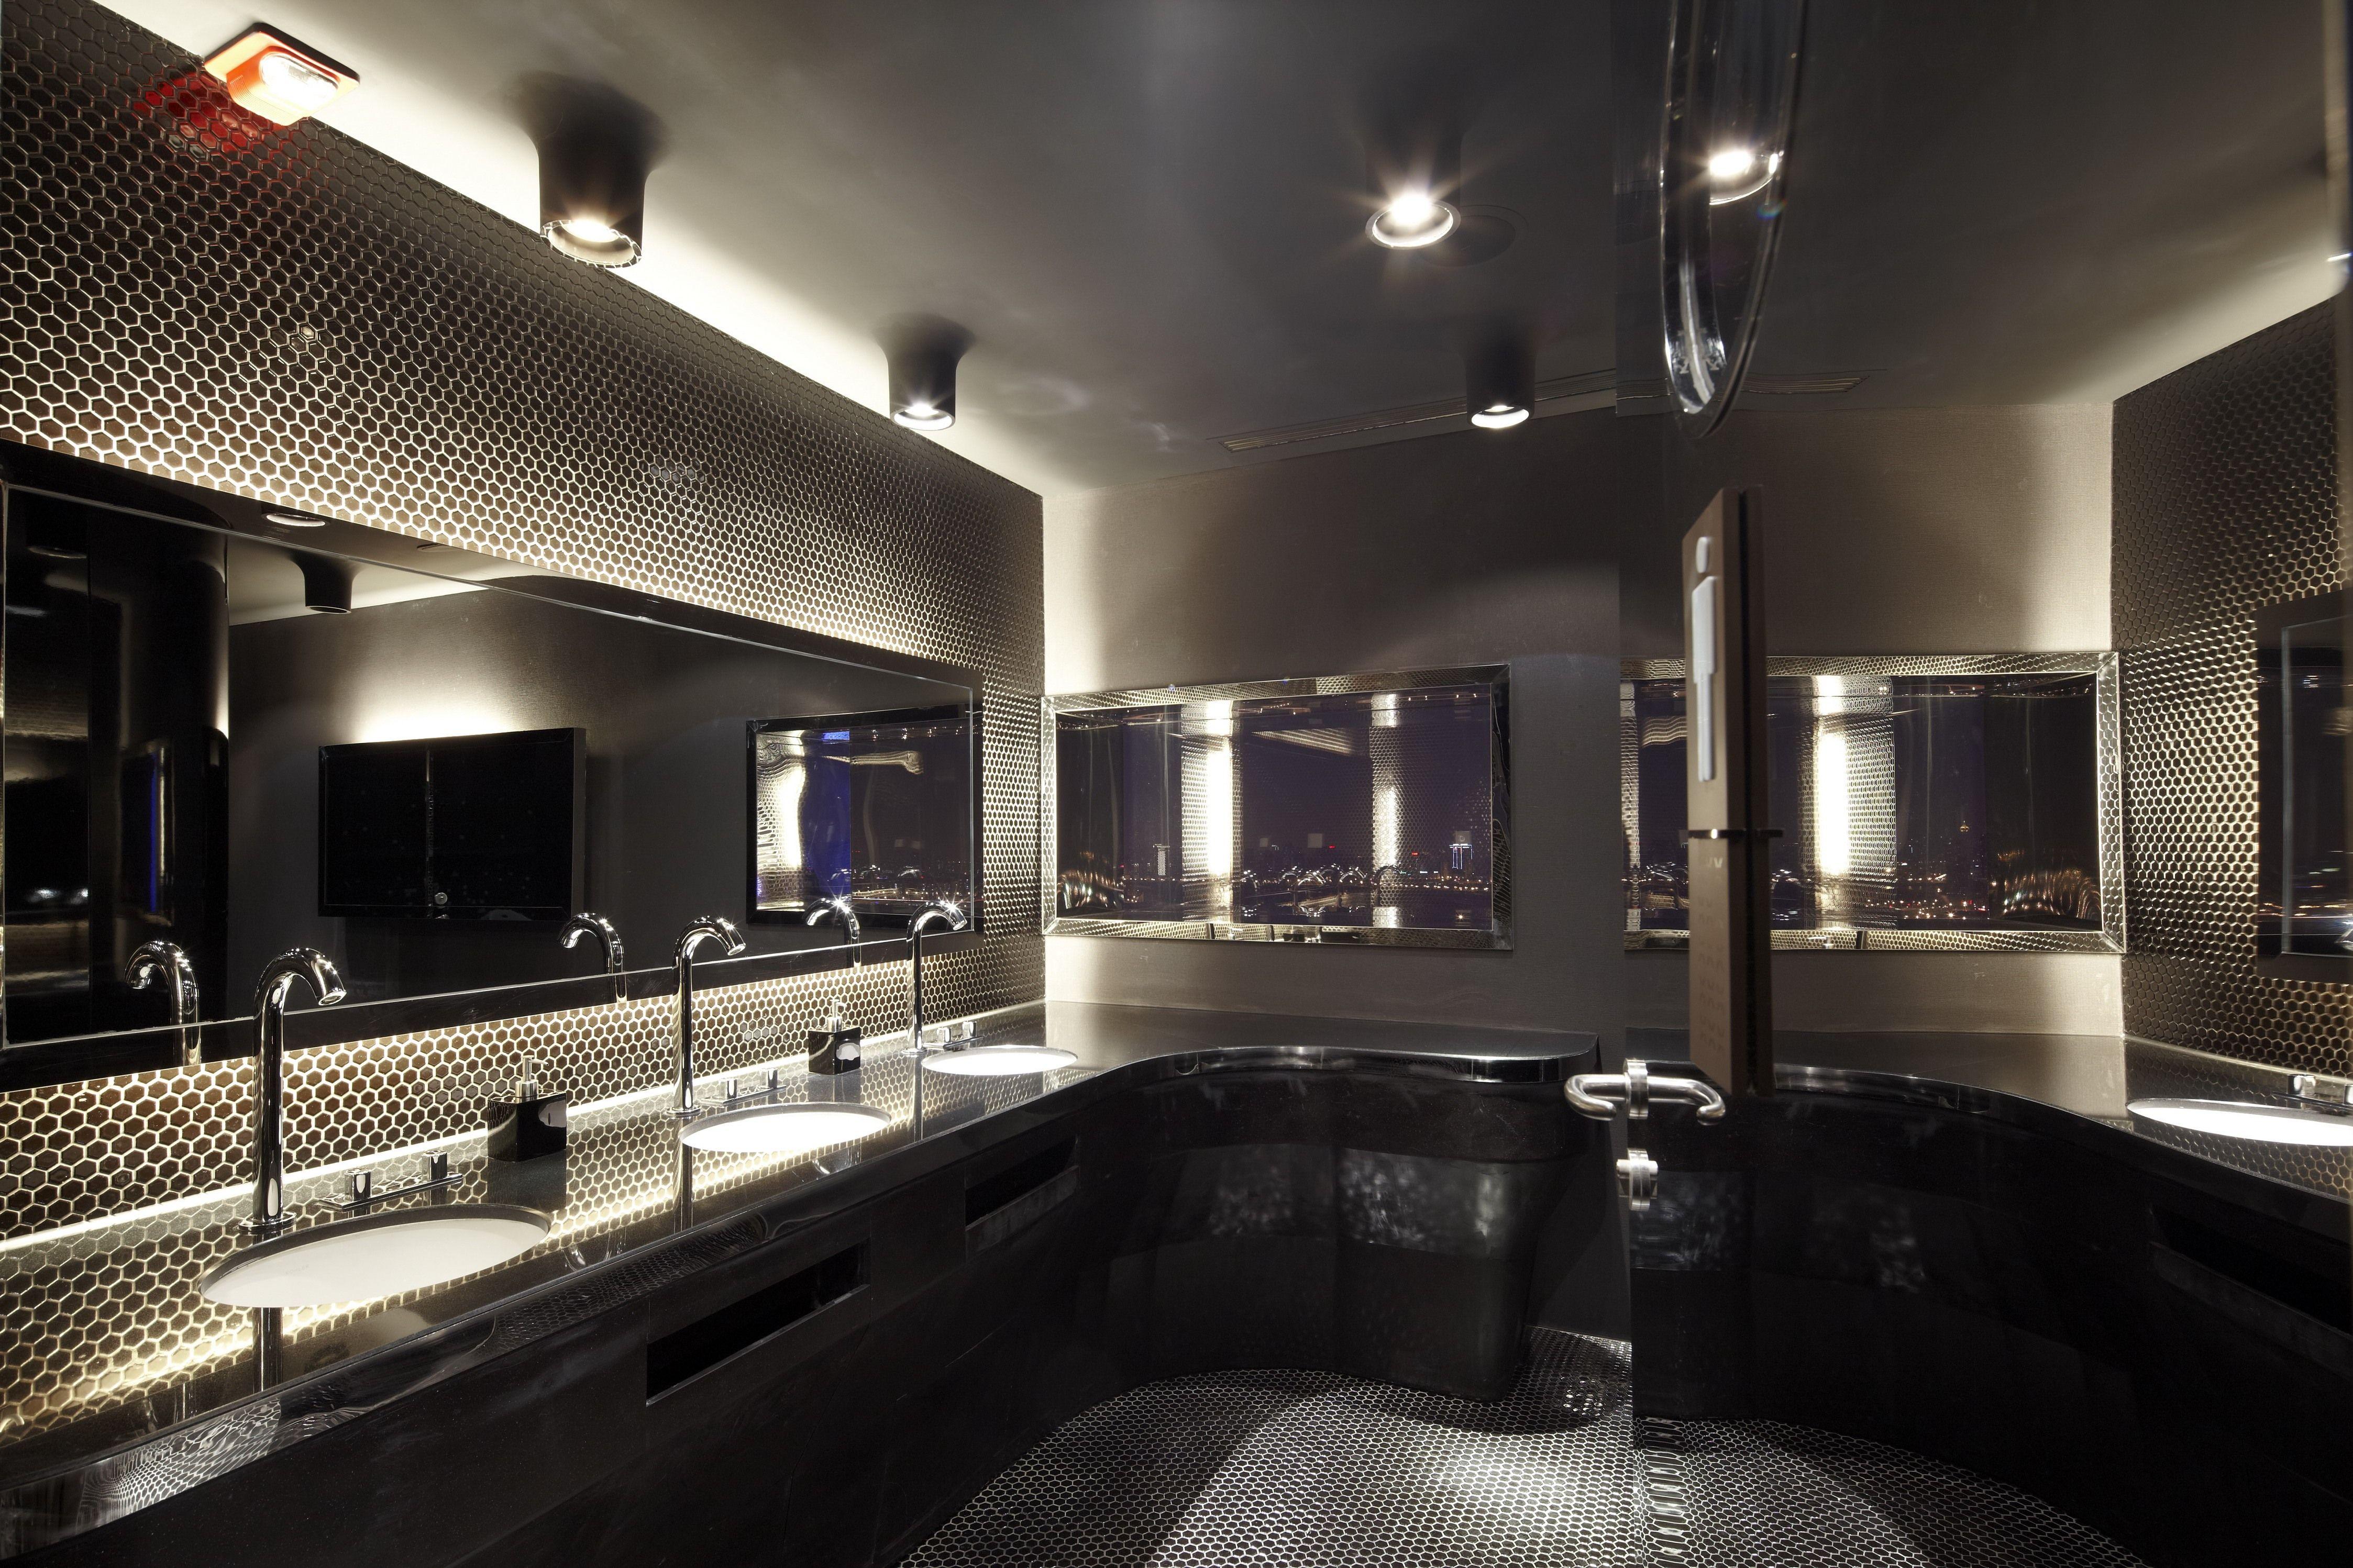 Hotel Bathroom Design Google Search Bathroom Design Luxury Restroom Design Hotel Bathroom